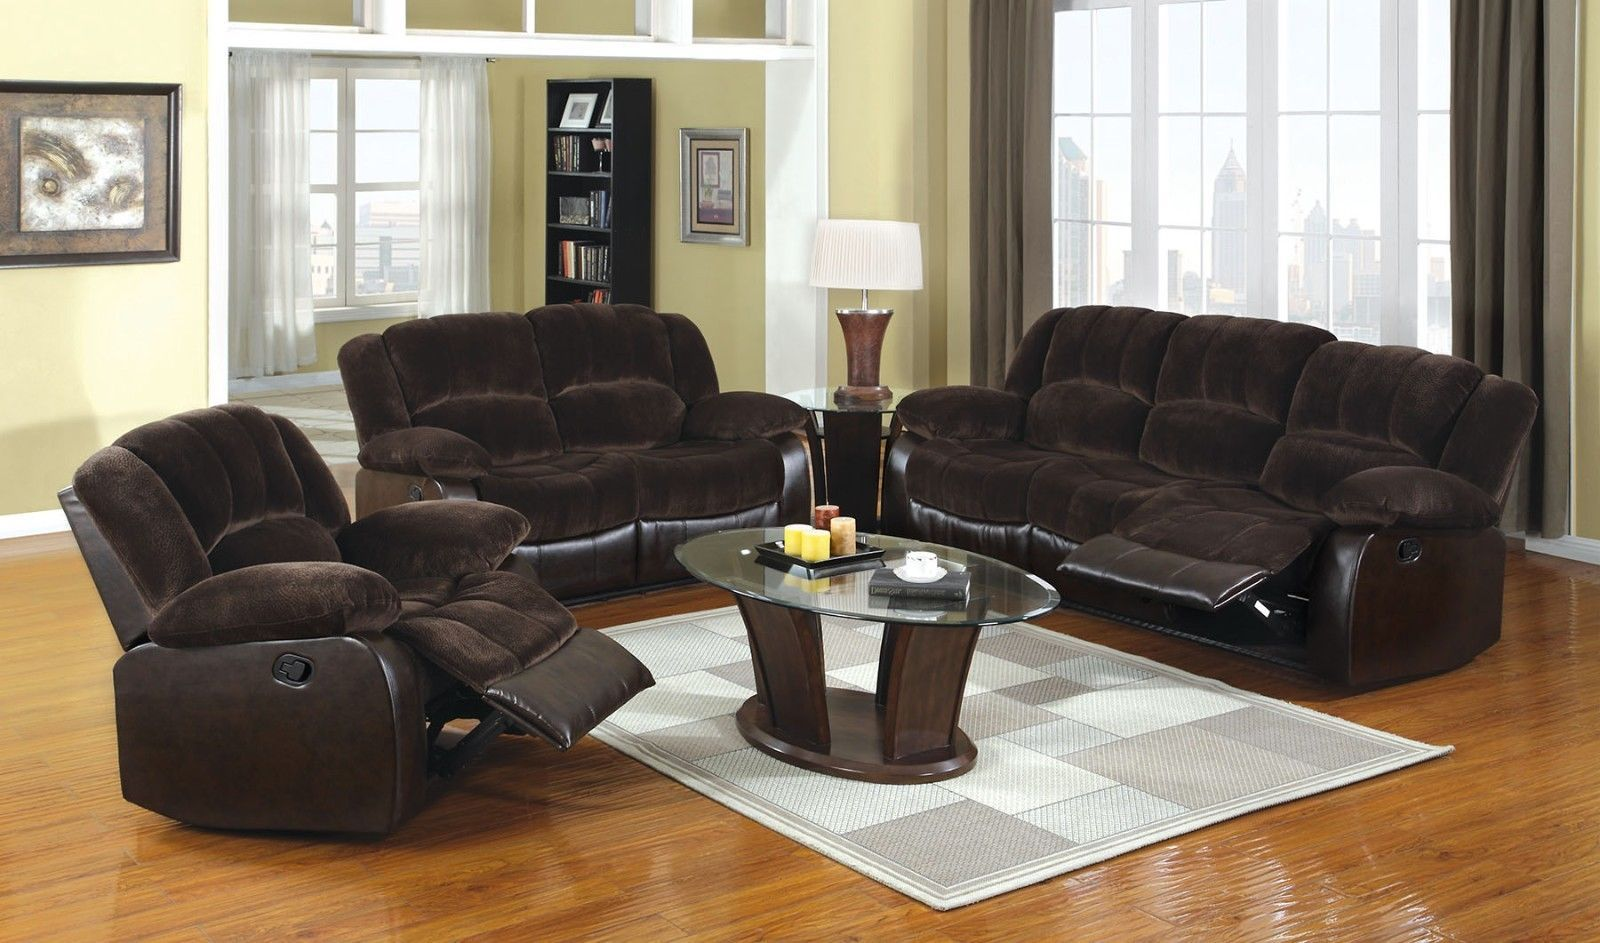 1549 99 modern reclining 2pc sofa set living room brown built in recliner sofa loveseat ❤ modern reclining living recliner loveseat design